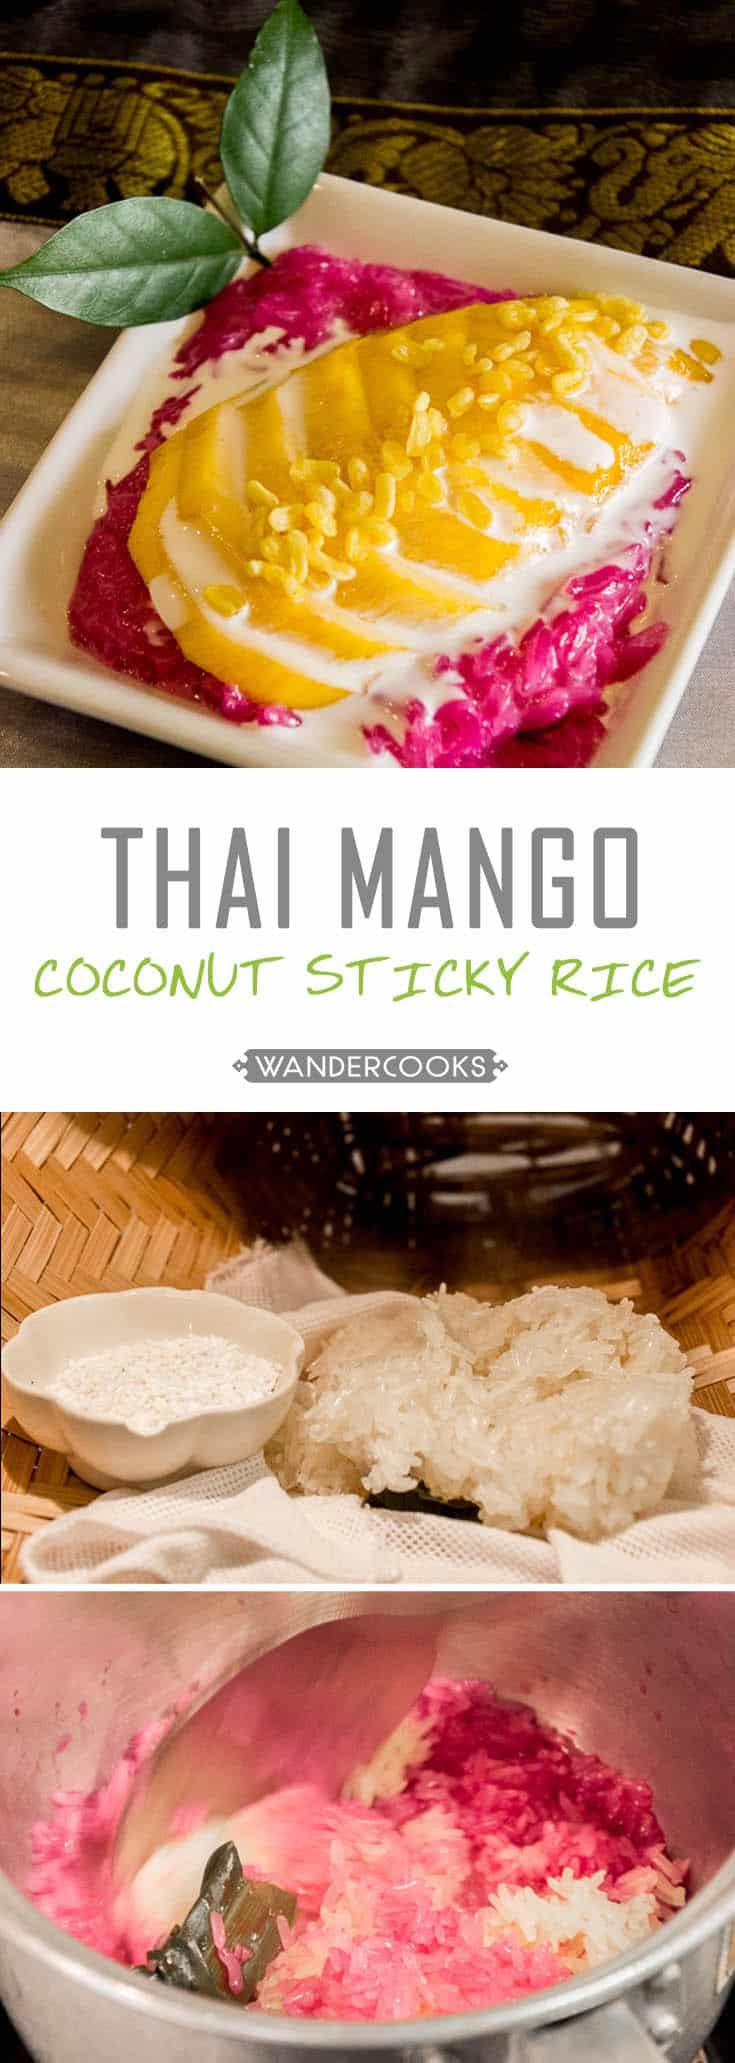 Mango Coconut Sticky Rice | Wandercooks